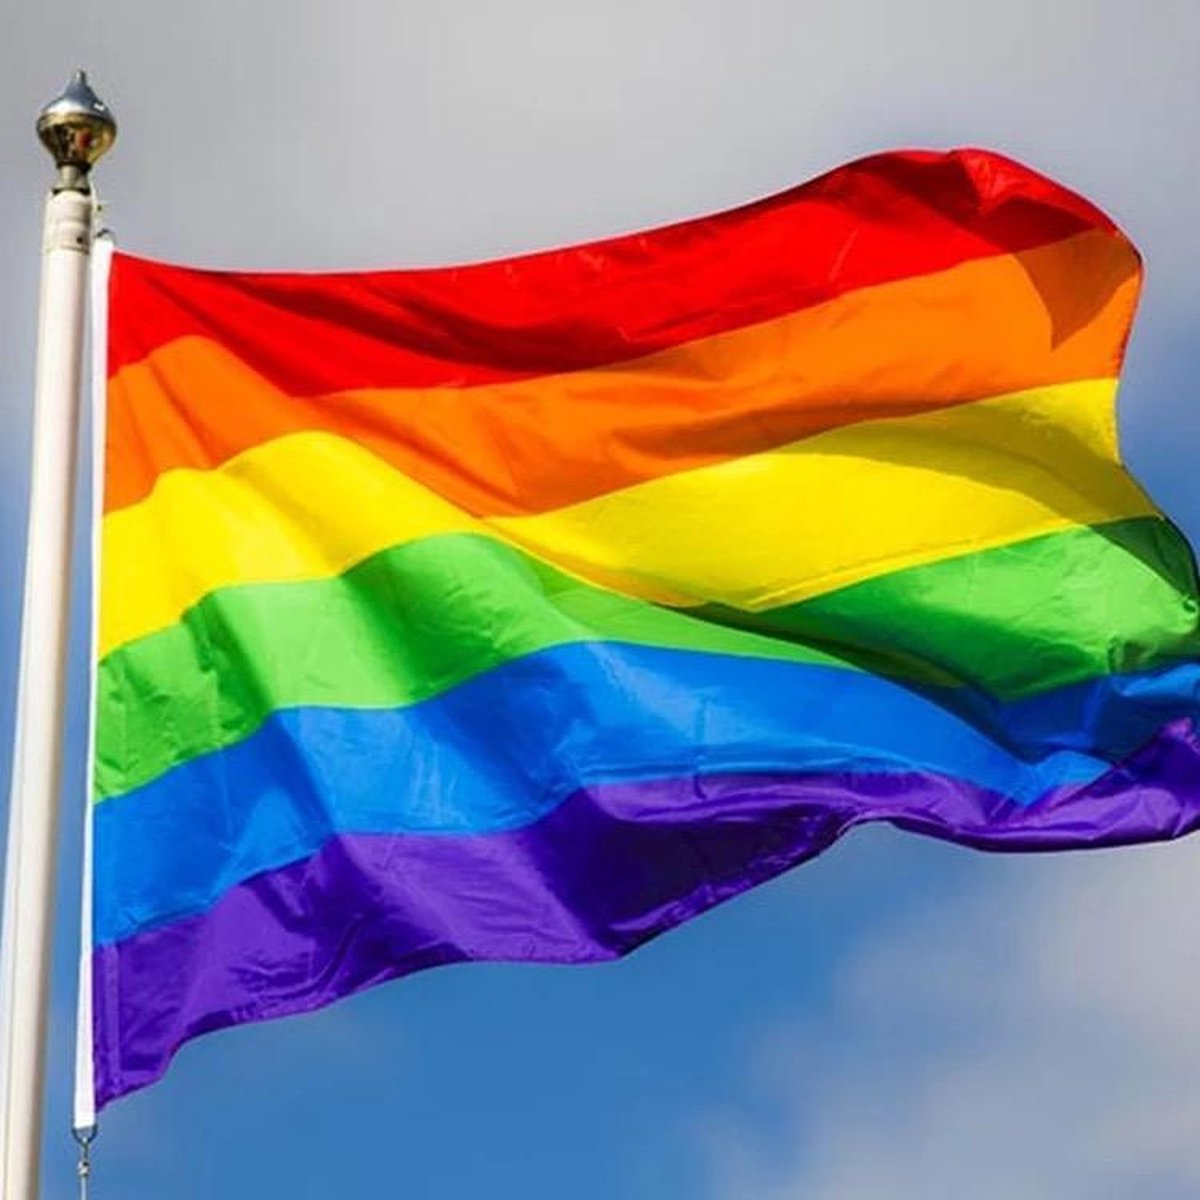 Regenboog vlag 90x150cm   -Pride vlag - LGBT vlag - Gay vlag - Gaypride - Rainbow Flag -Regenboogvlag -  LGBT Gay Pride Vlag